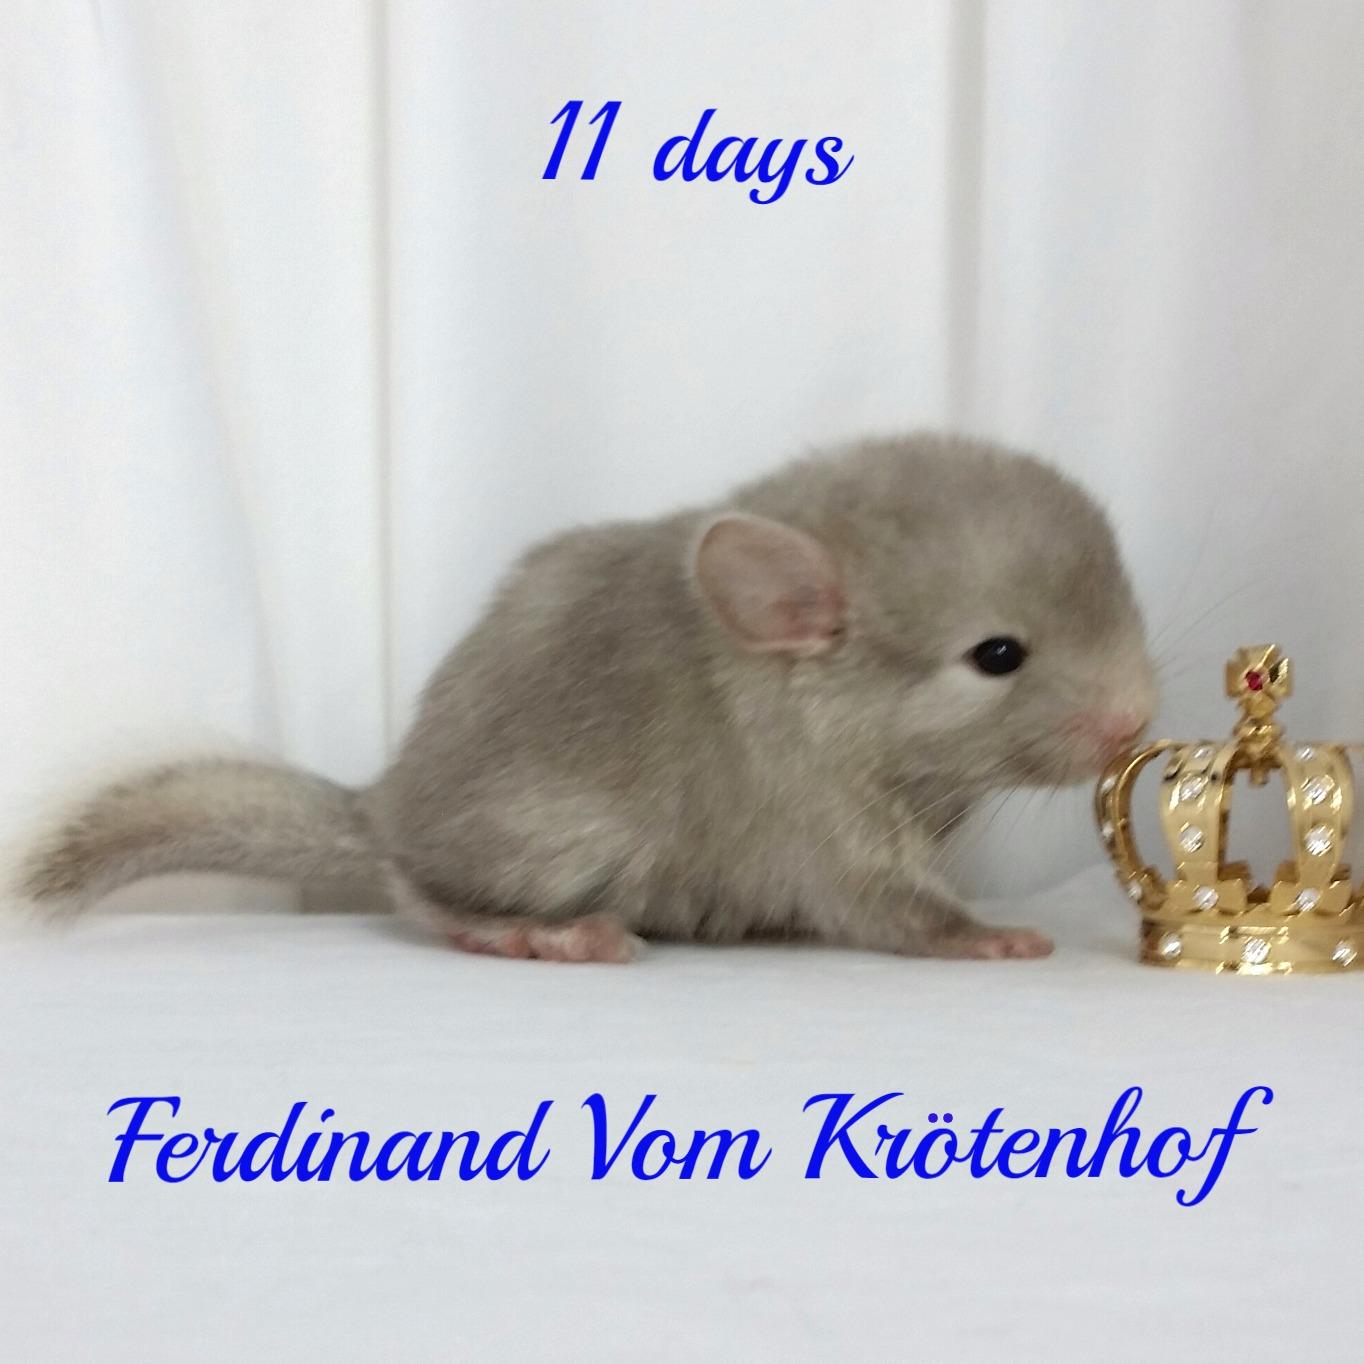 Ferdinand Vom Krotenhof